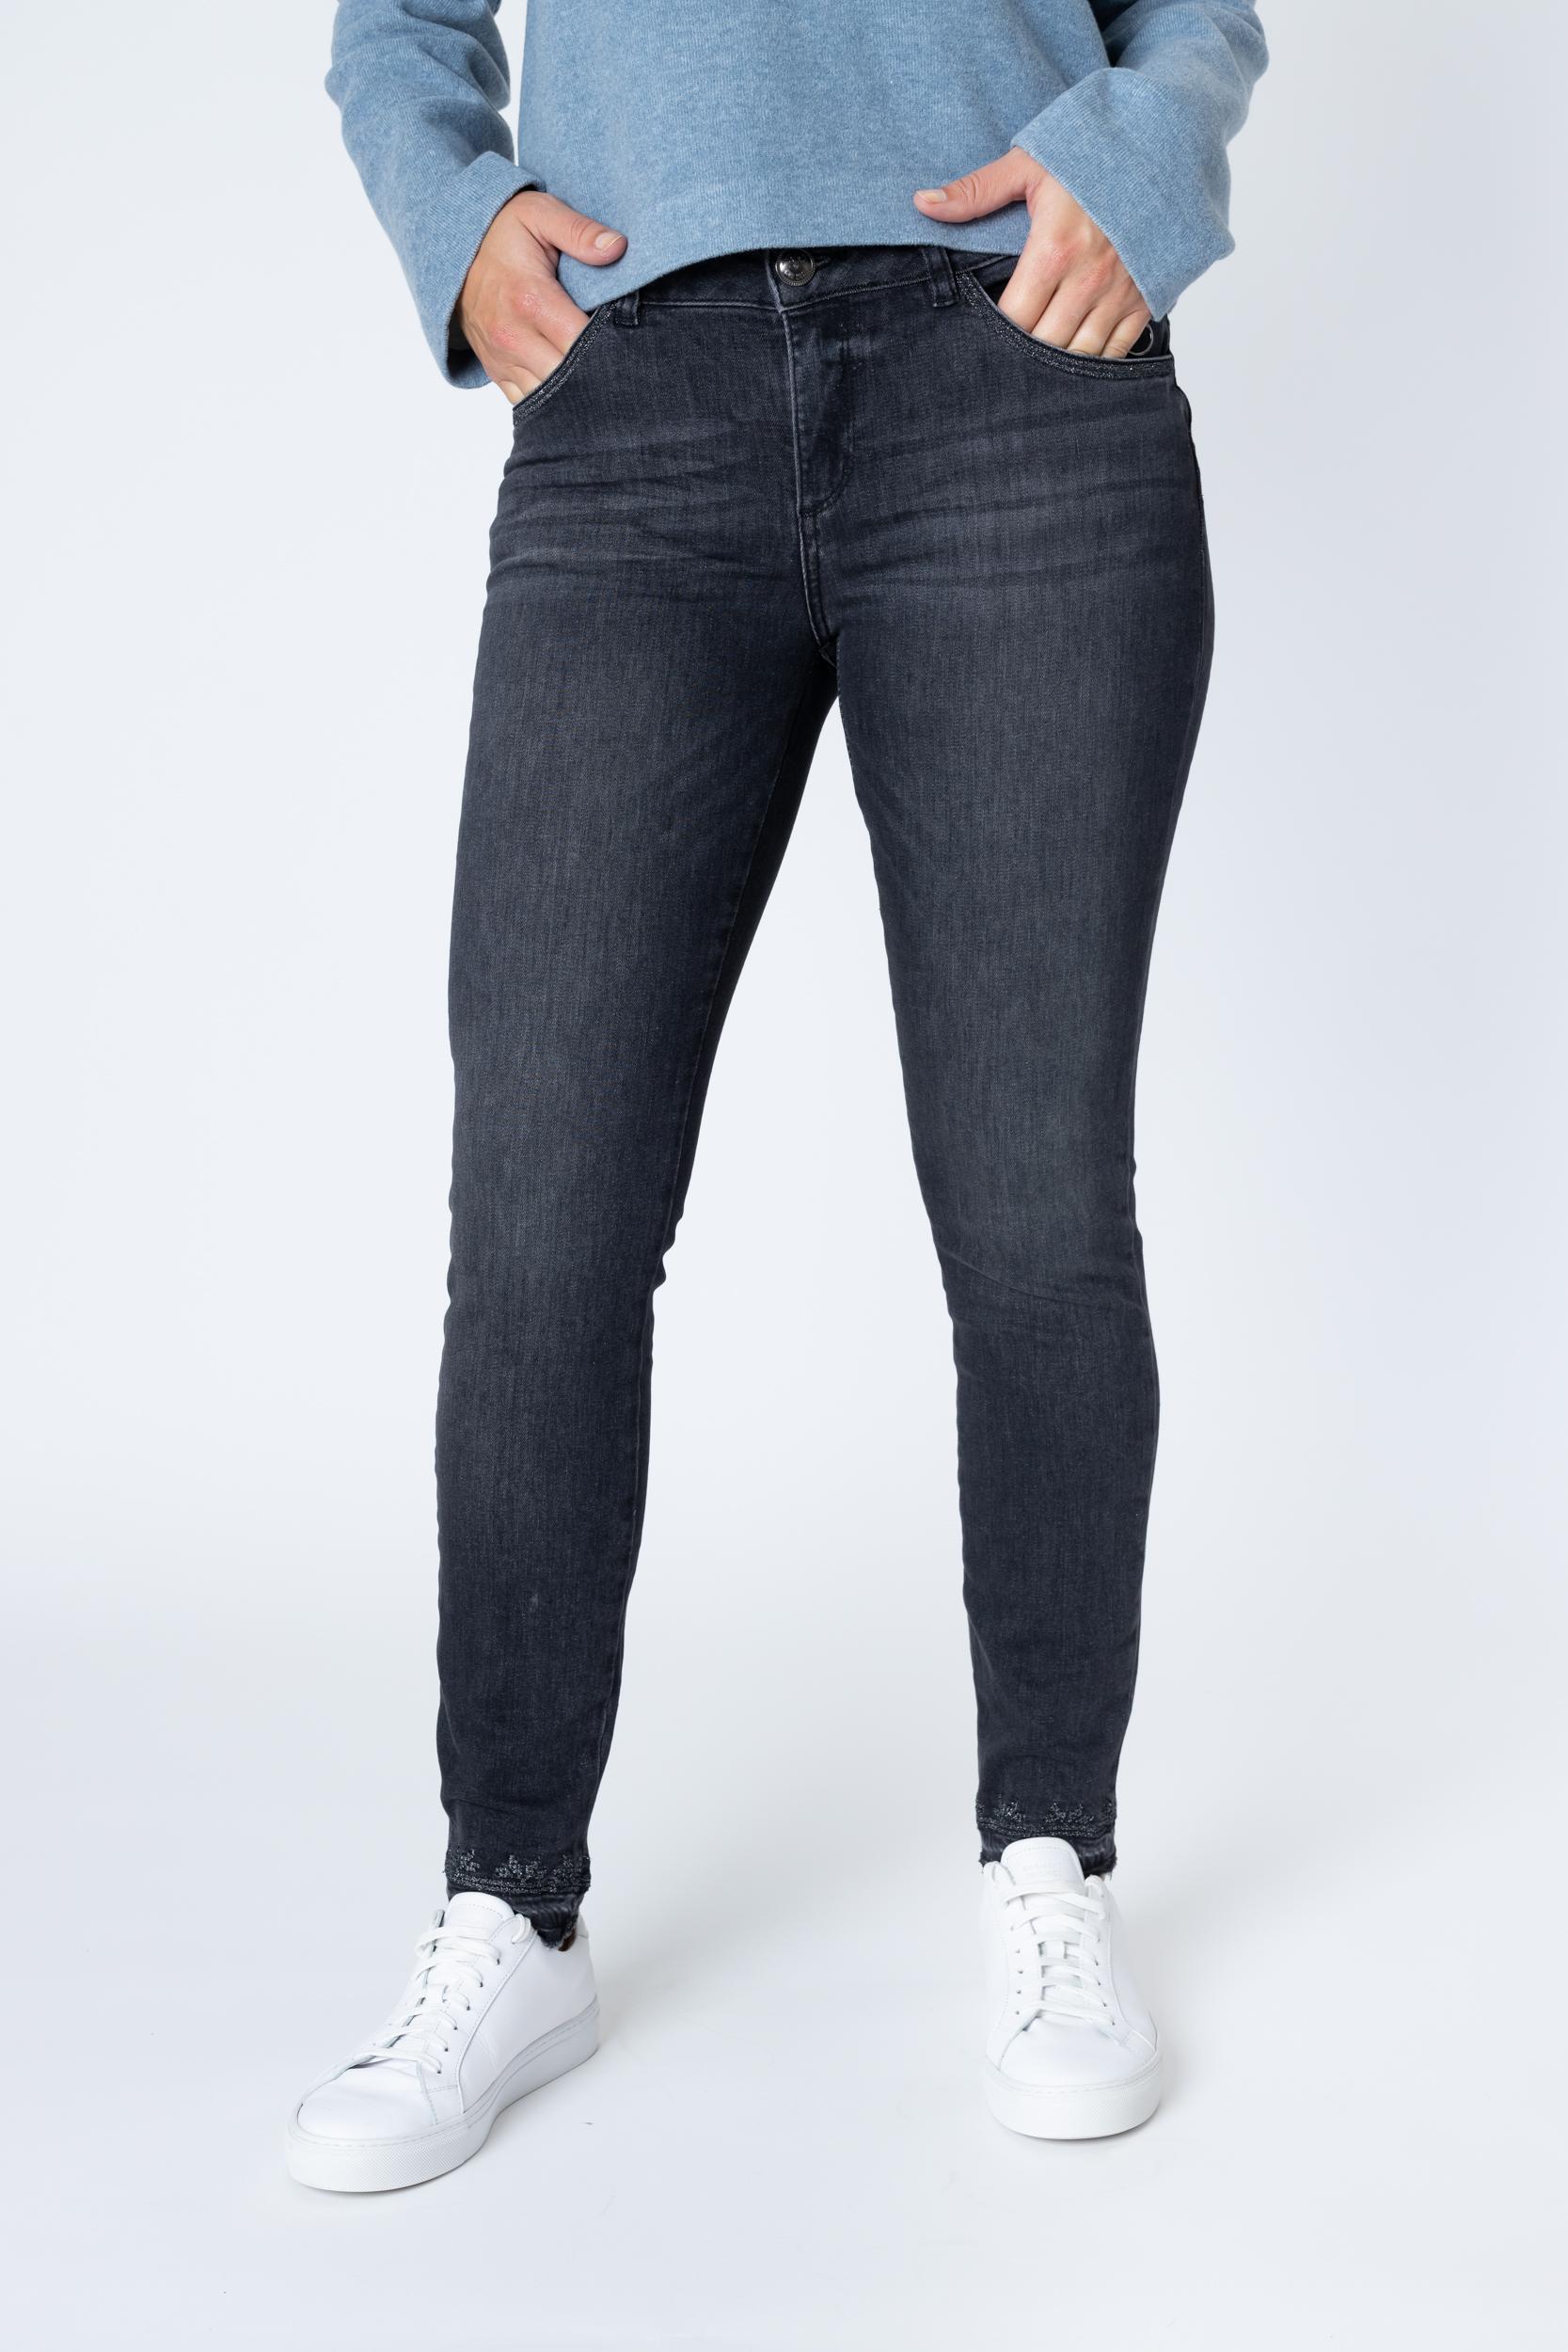 Jeans Sumner Regent